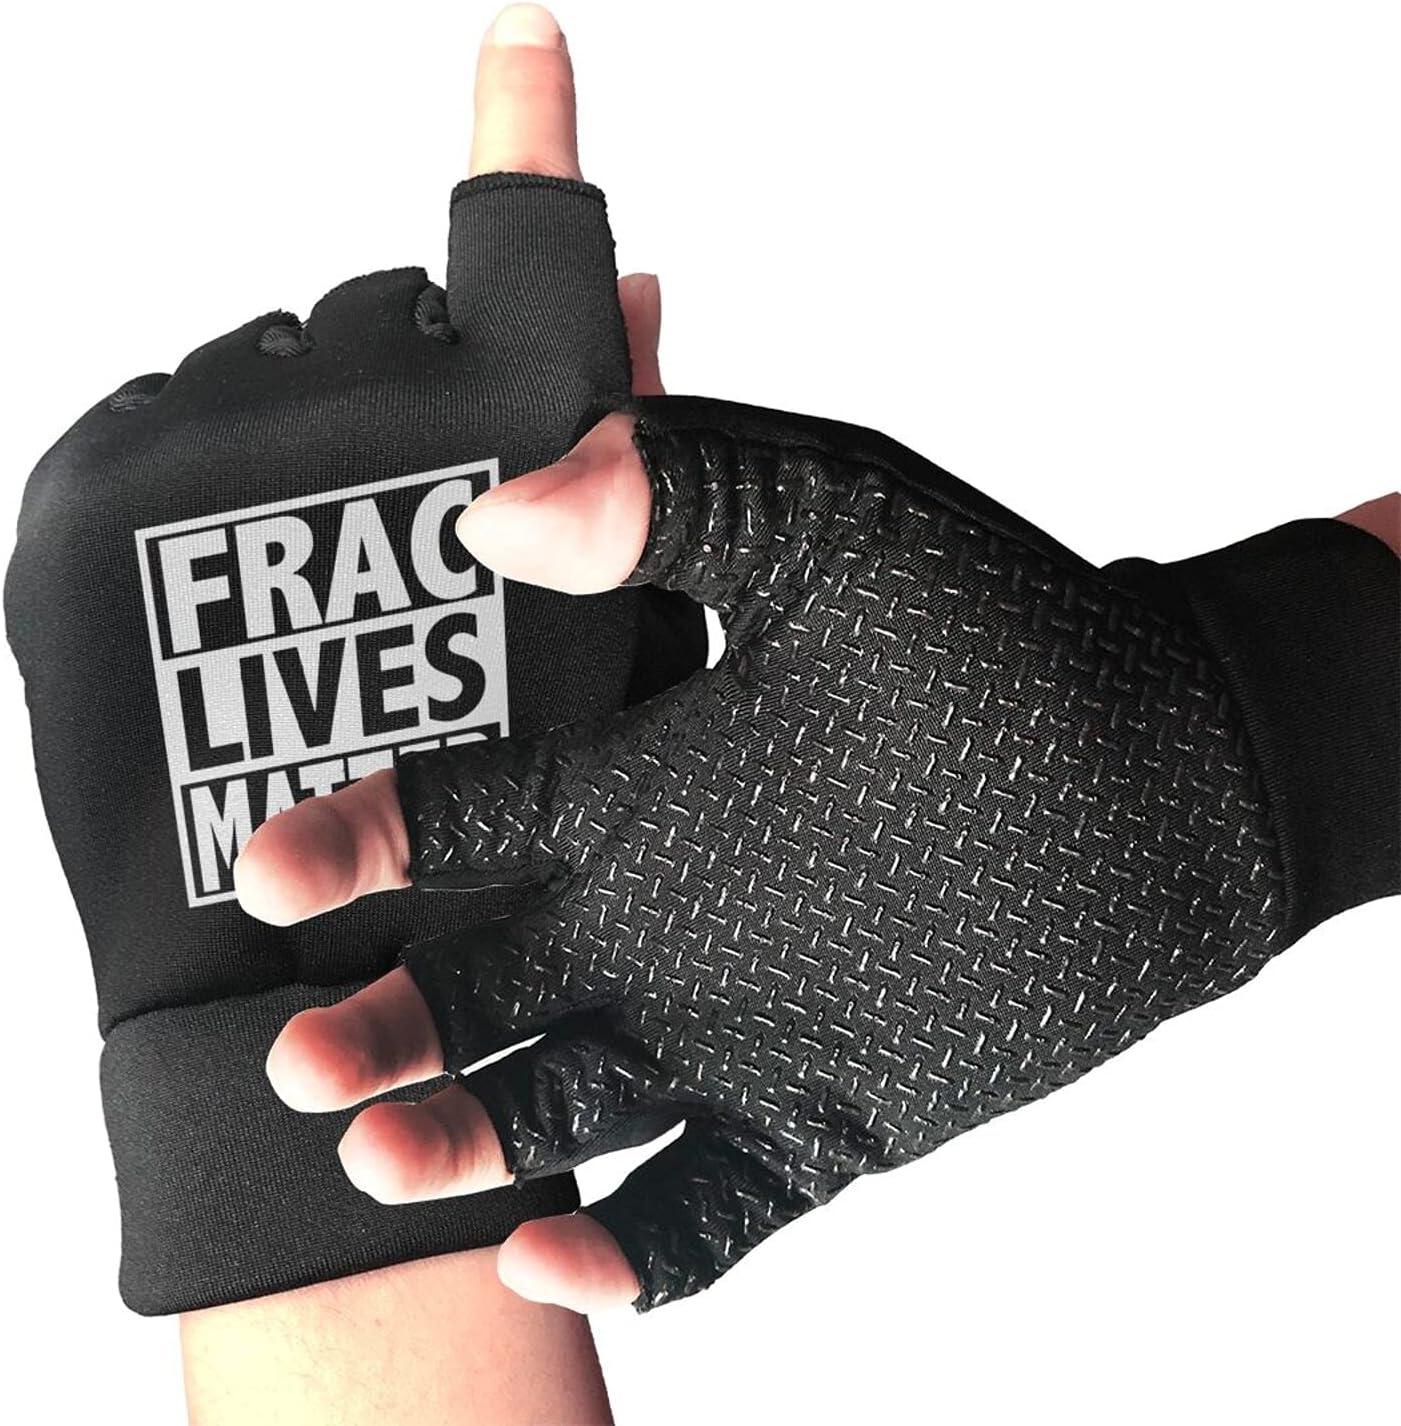 New product!! FRAC favorite Lives Matter Sports Gloves Saf Suitable Exercise for Unisex